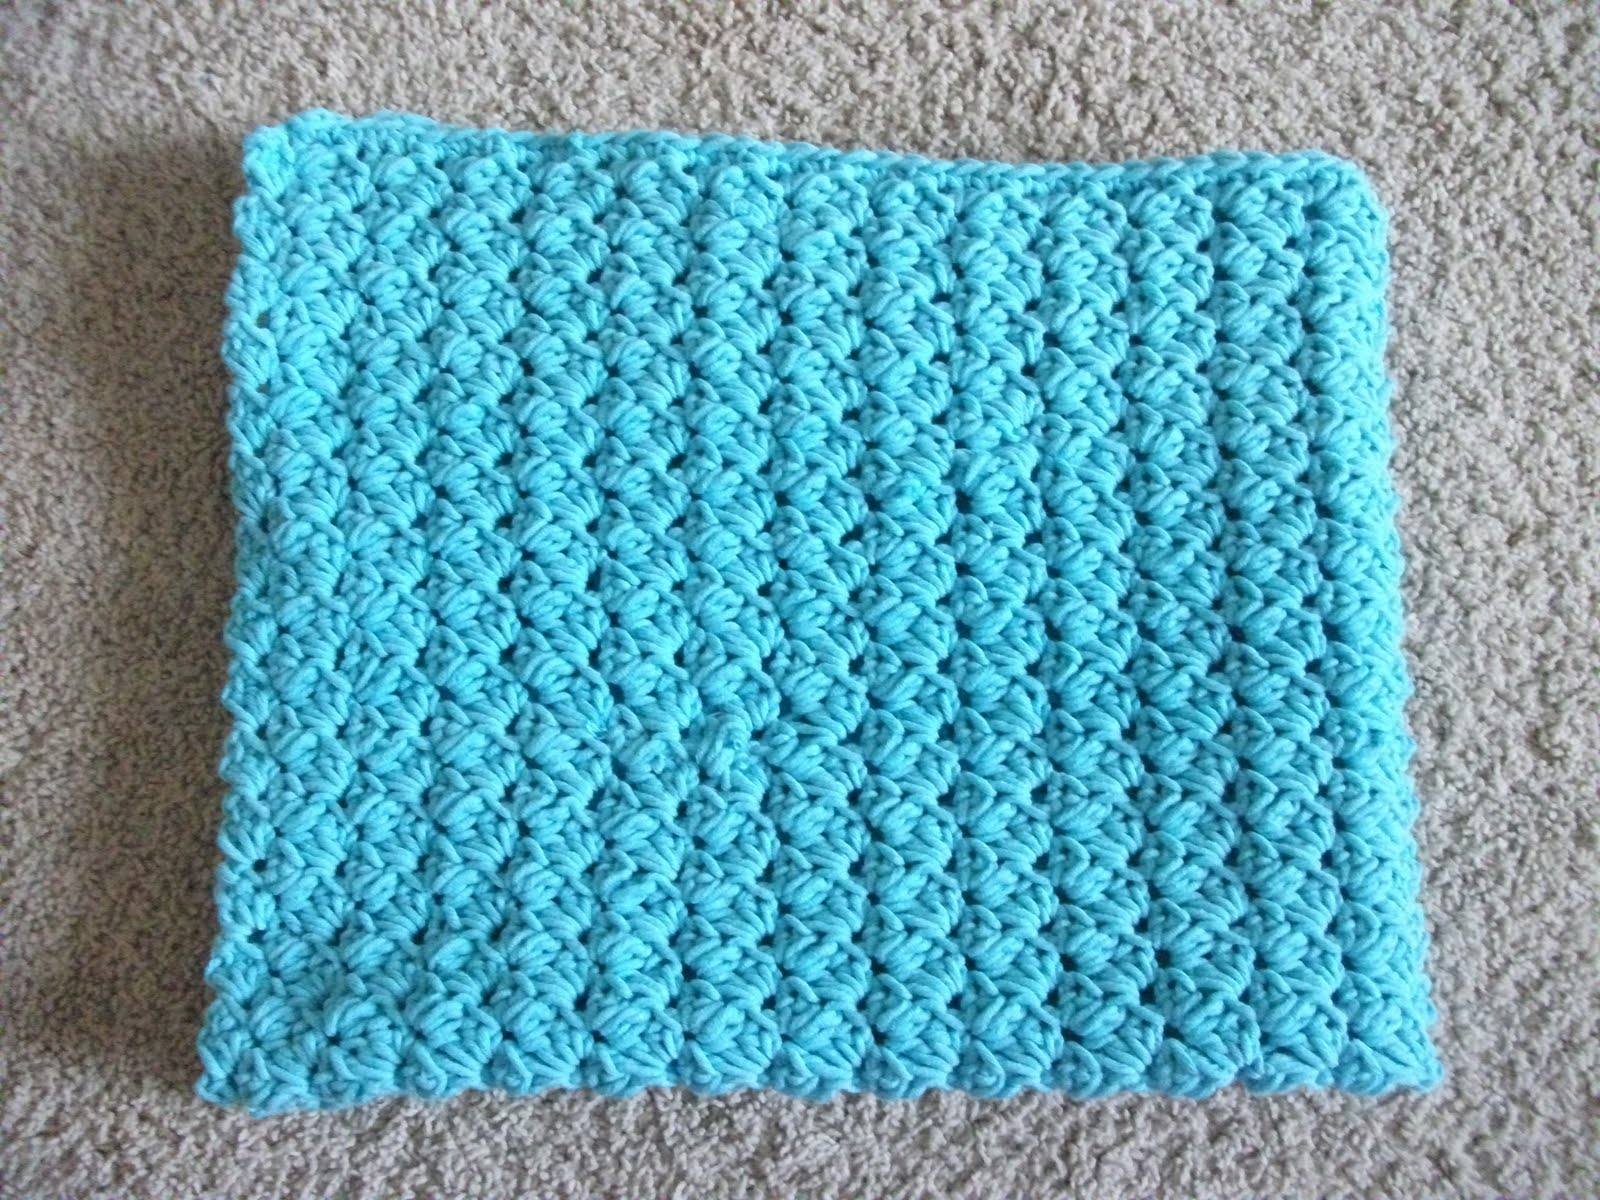 Free Crochet Patterns Bernat Baby Blanket Yarn : Baby Clouds Yarn Patterns Free Patterns LONG HAIRSTYLES